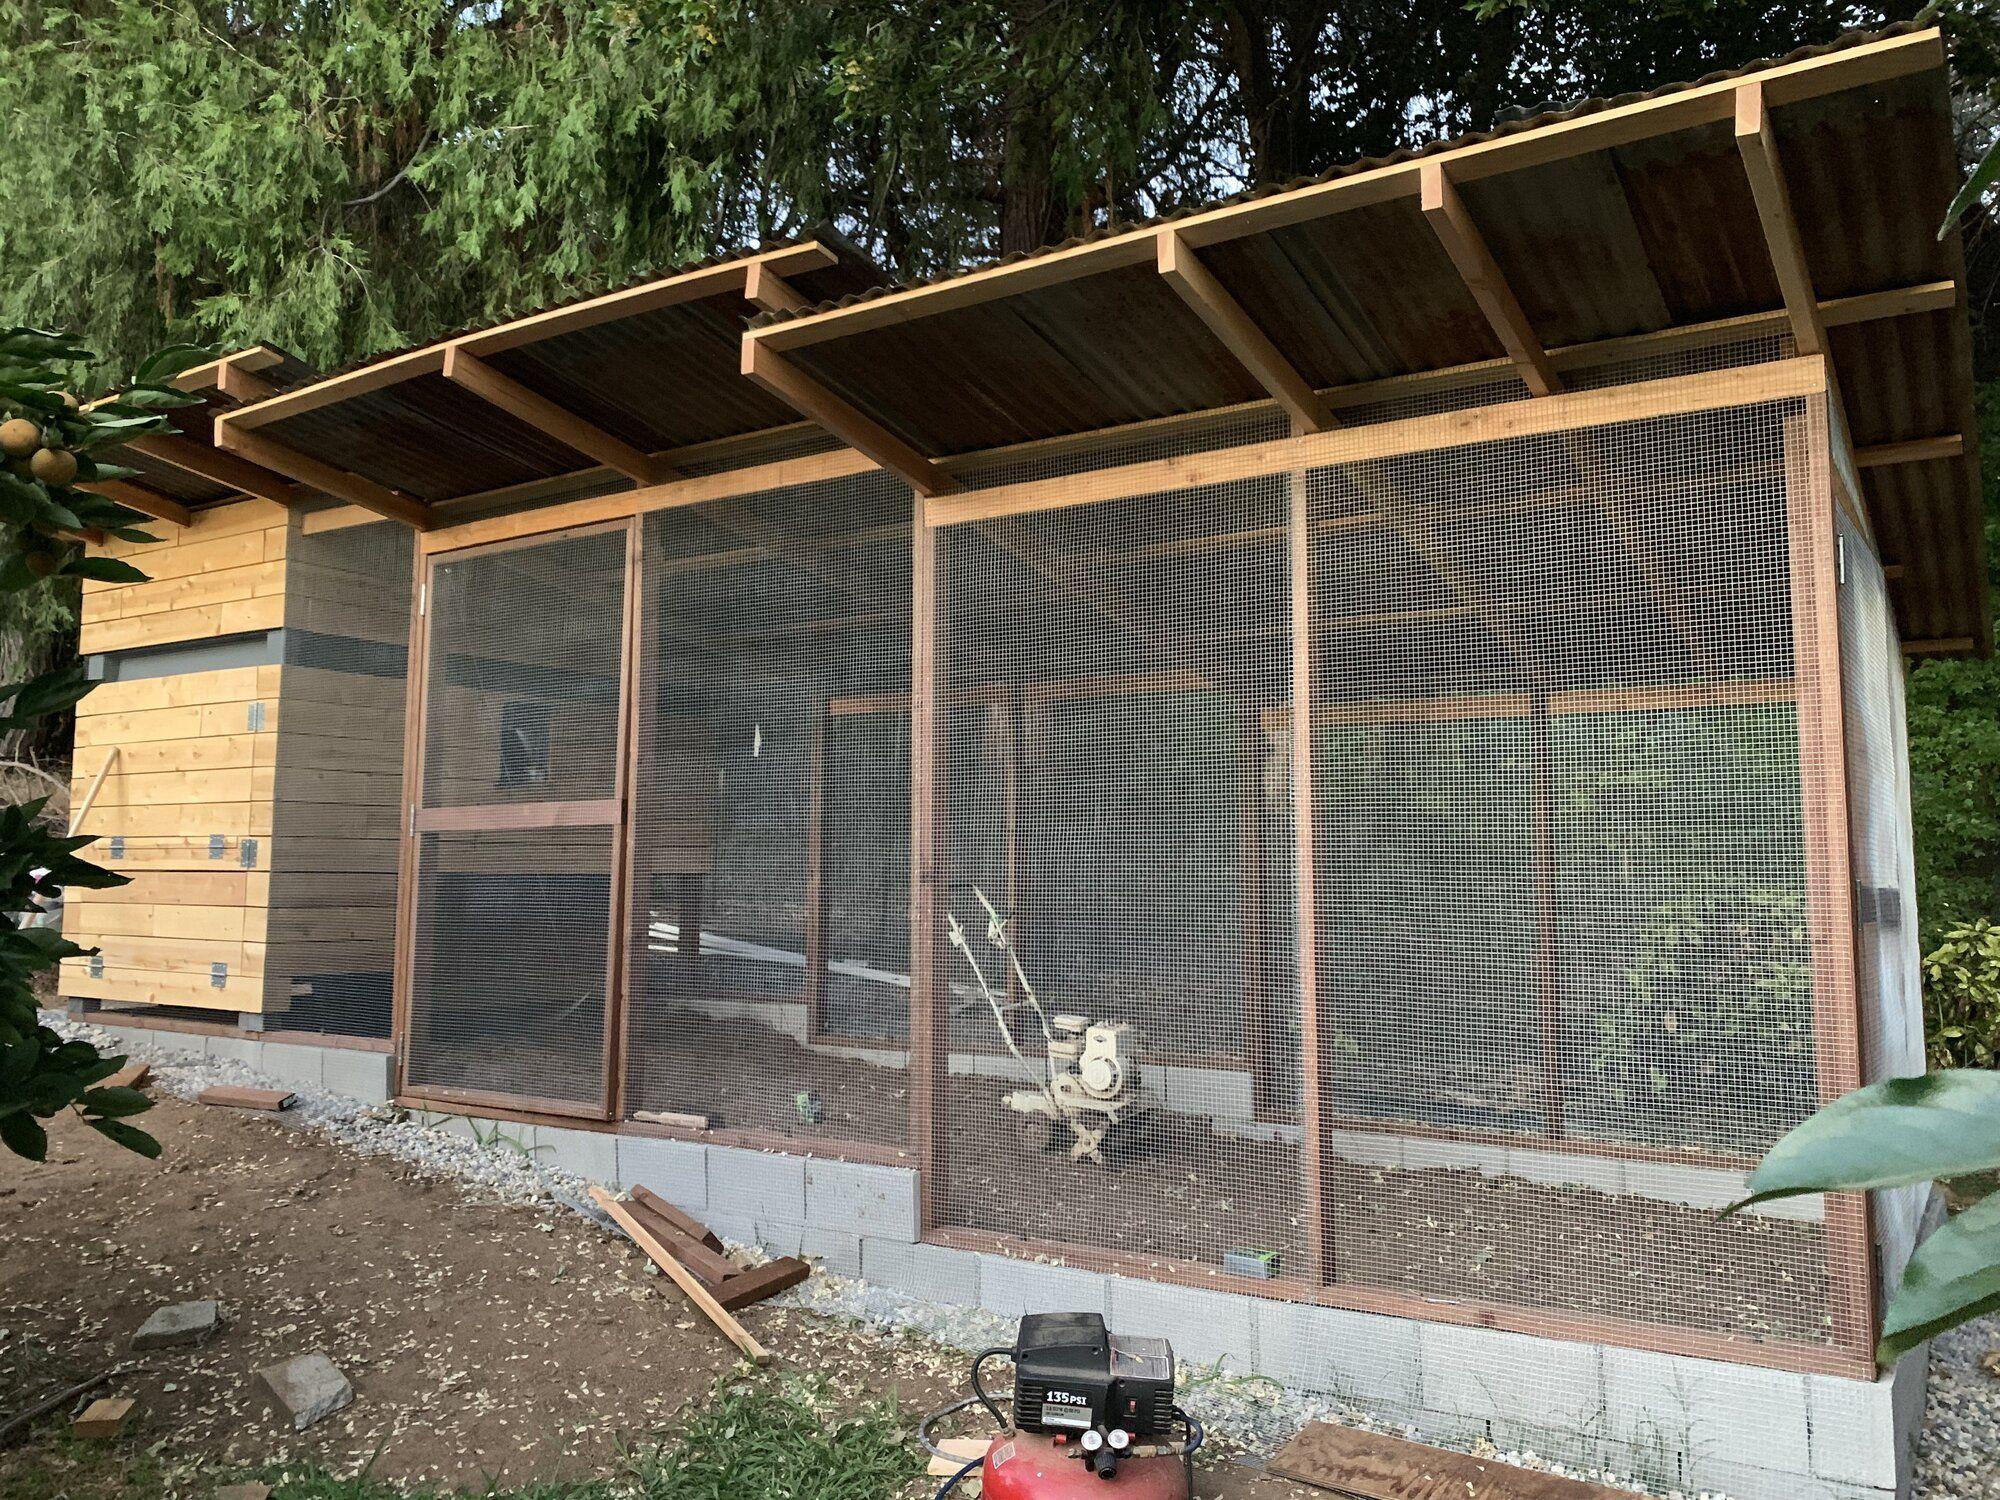 Perkolator S Modern Chicken Estate 2019 In 2020 Corrugated Metal Roof Chickens Backyard Urban Design Architecture